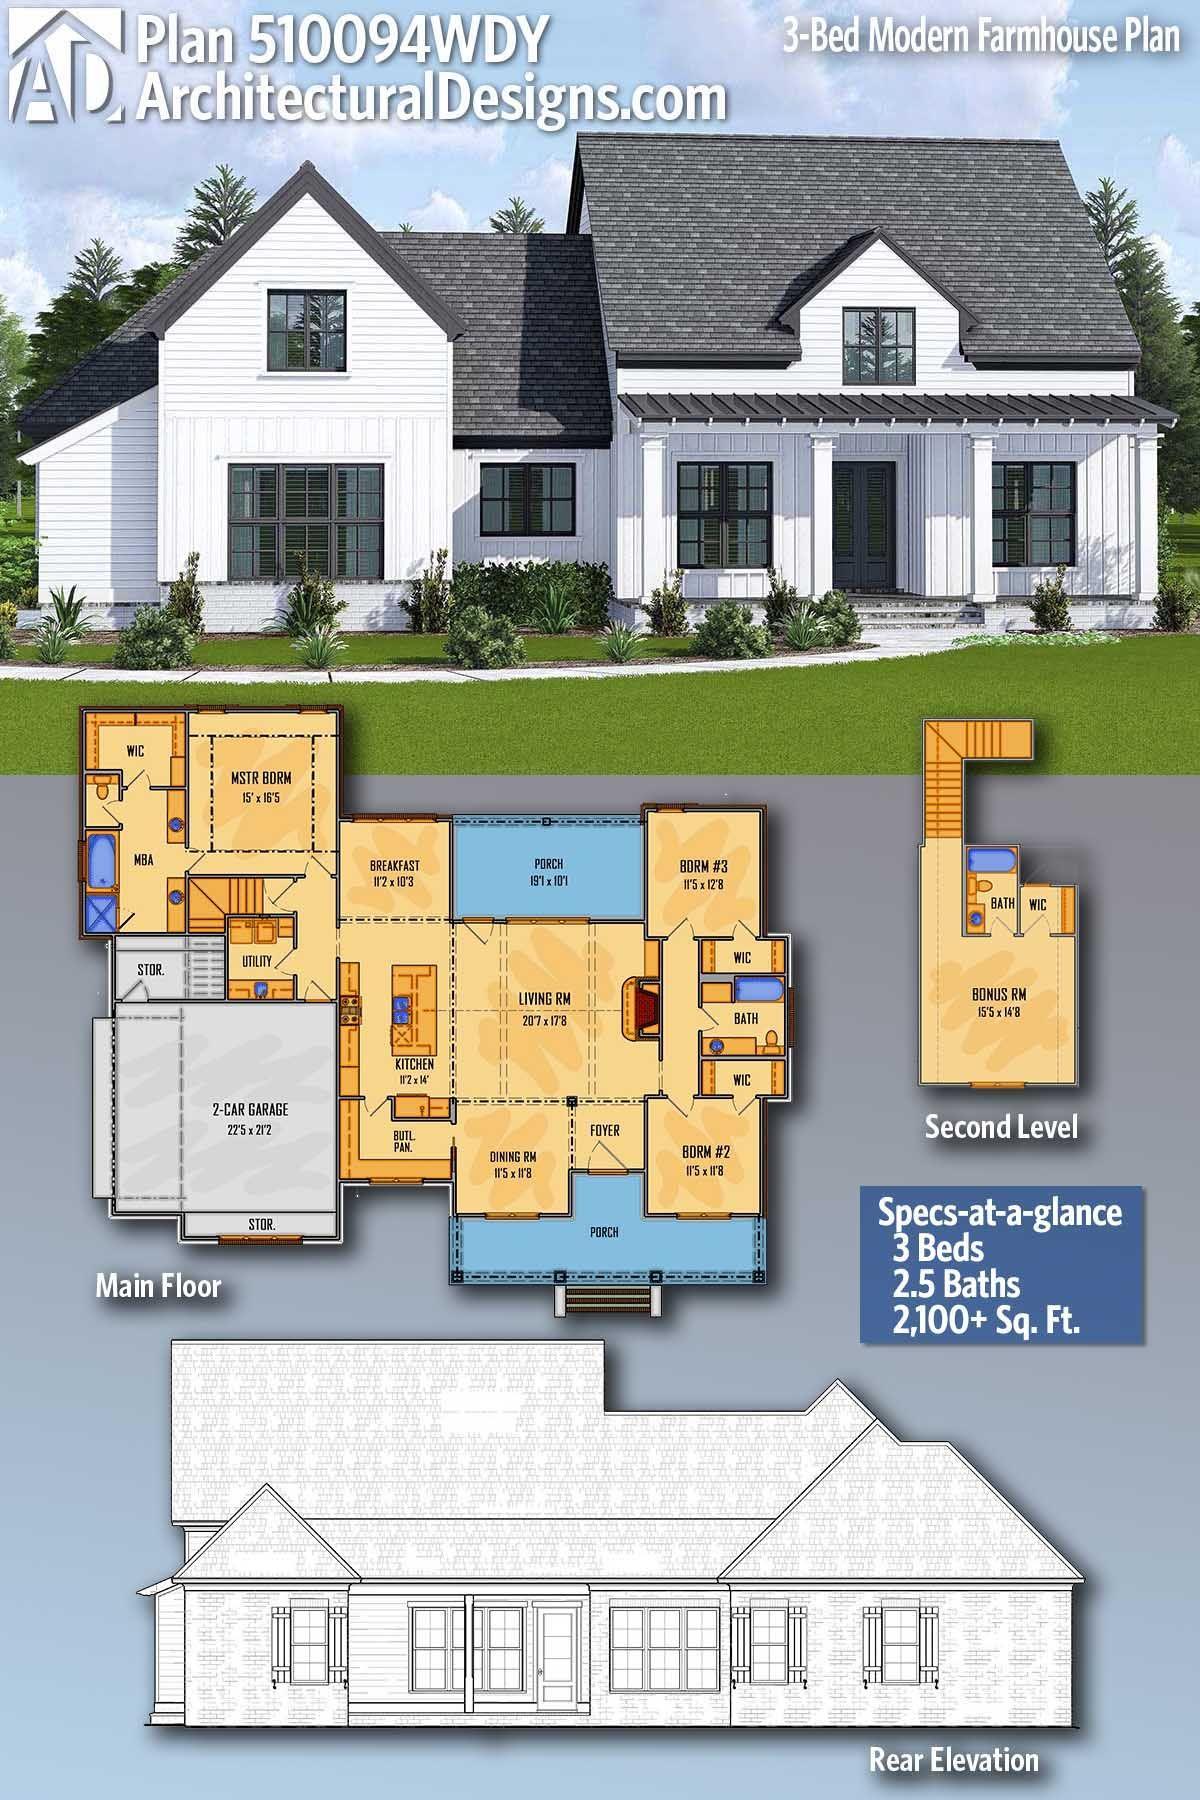 Plan 510094wdy 3 Bed Modern Farmhouse Plan With Walk Through Pantry And Bonus Room Modern Farmhouse Plans Farmhouse Plans New House Plans